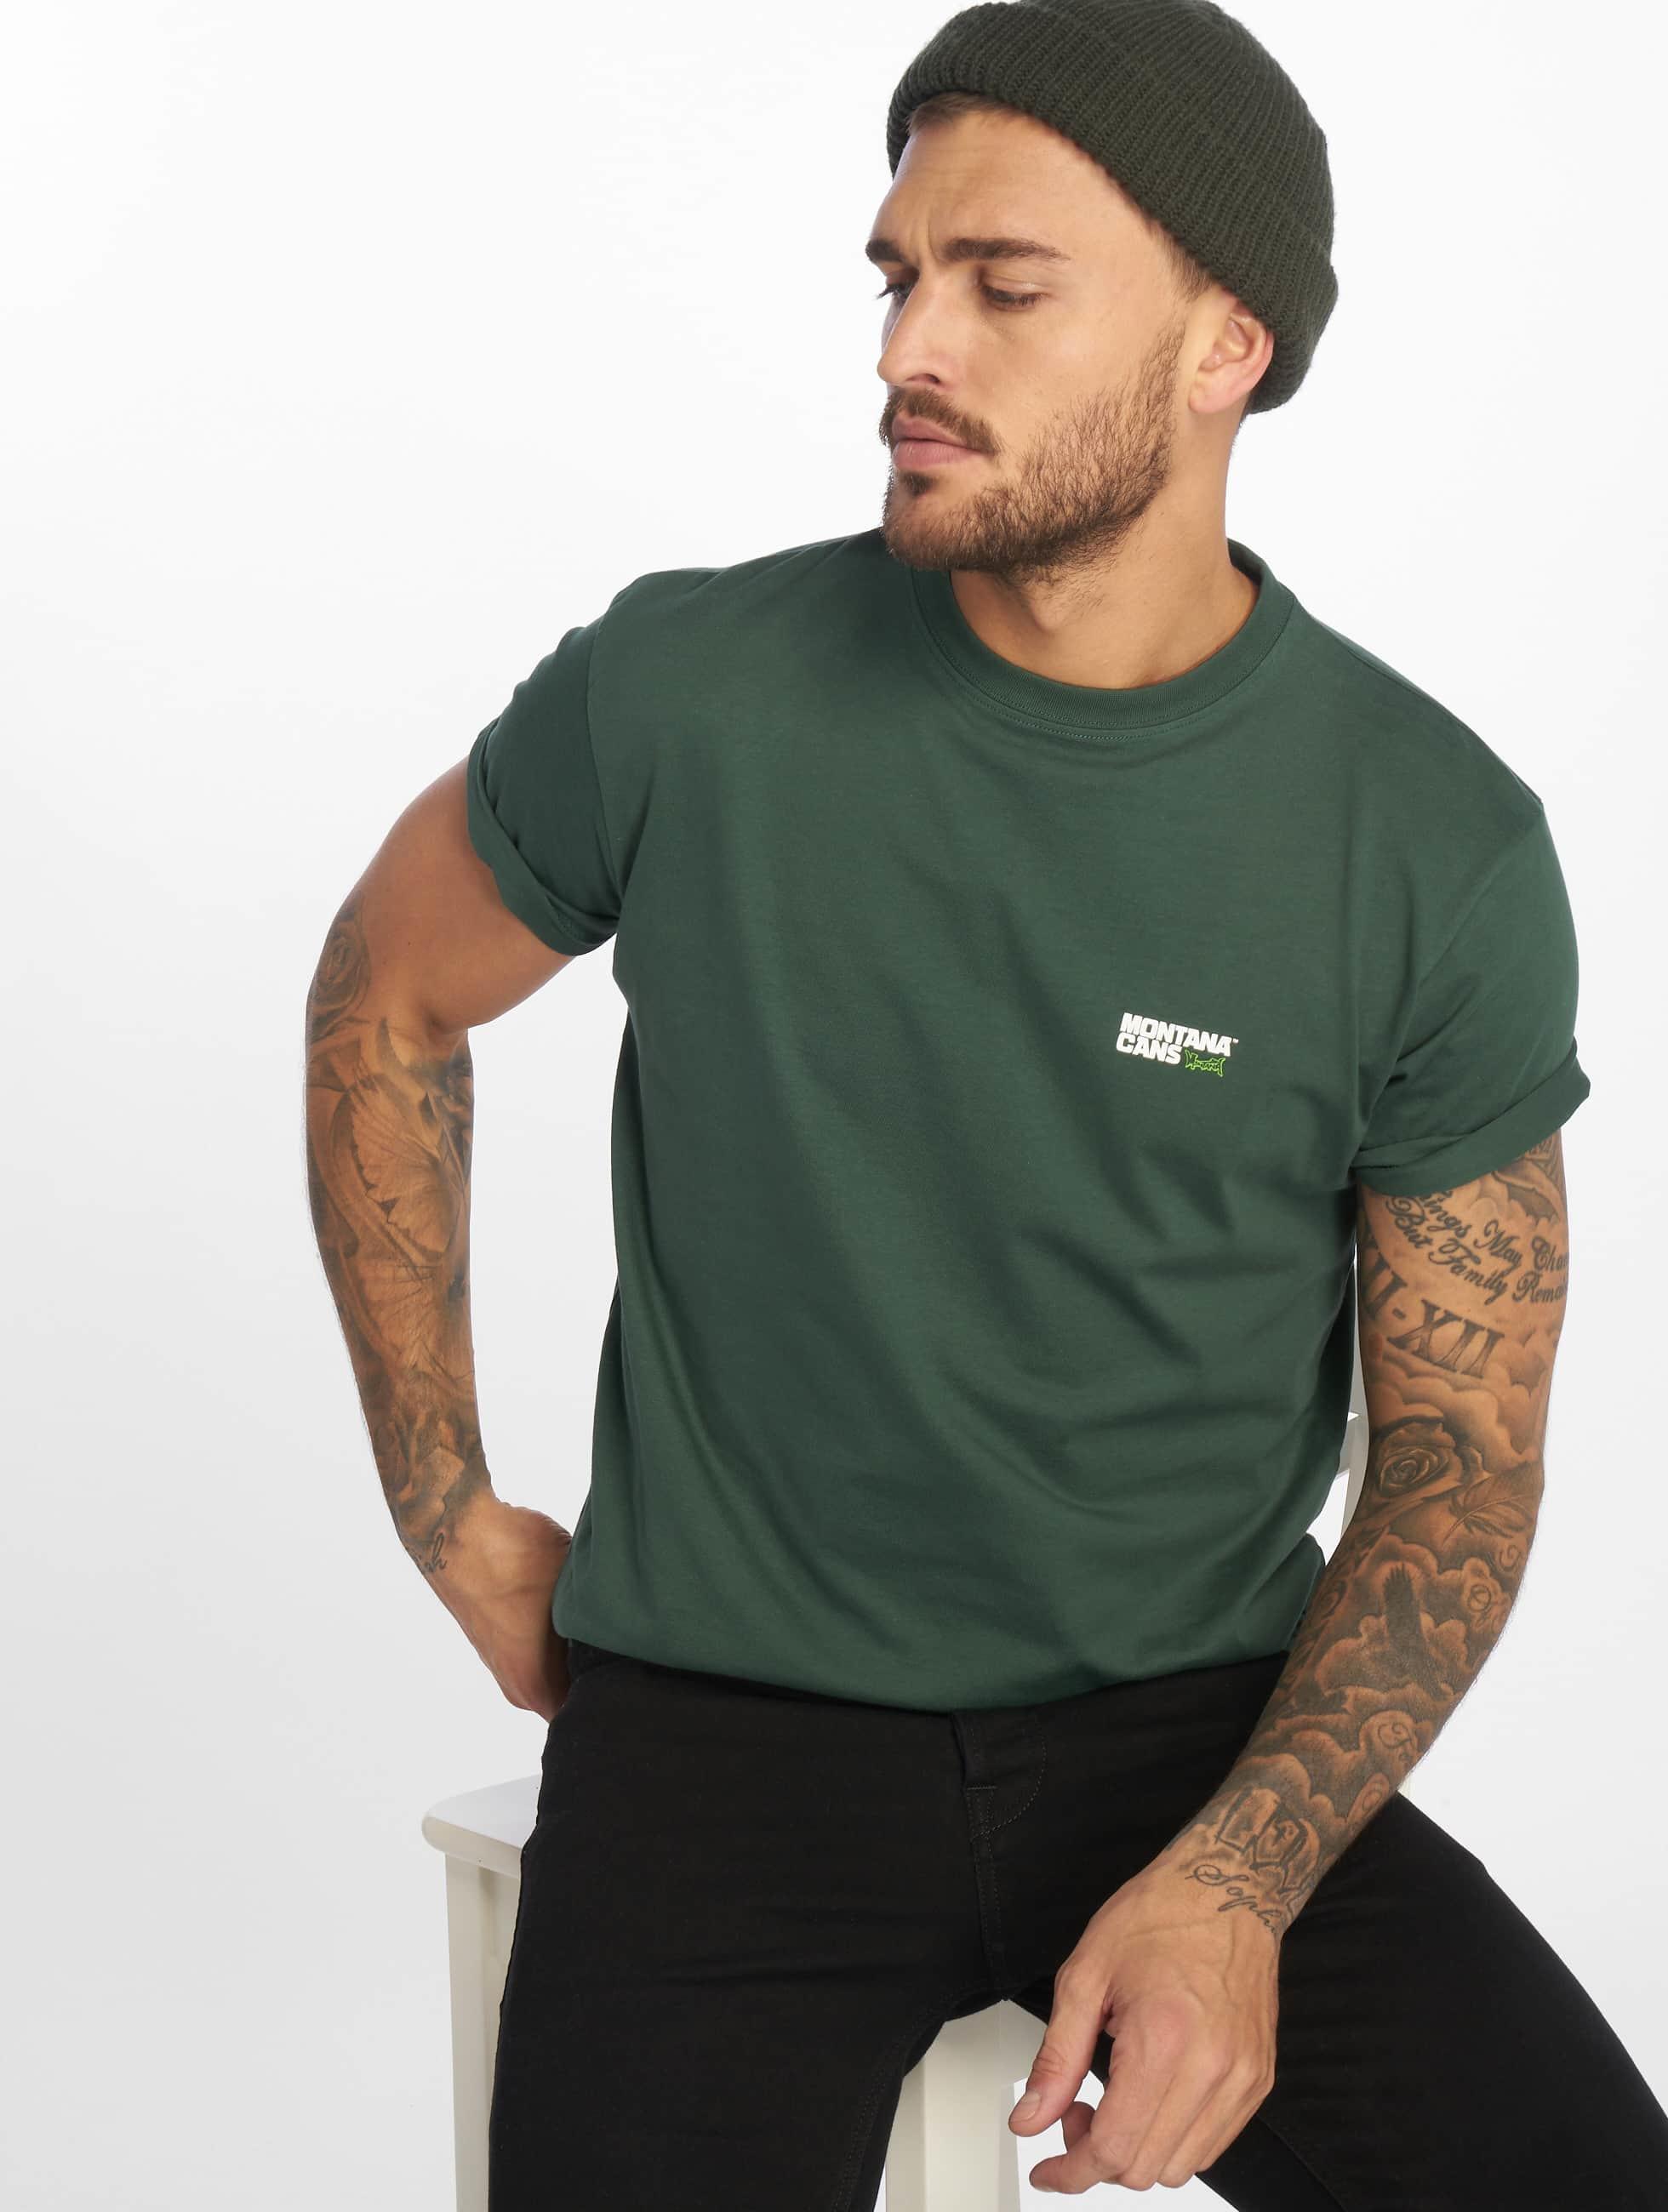 Montana | Clothing Typo Logo Small vert Homme T-Shirt